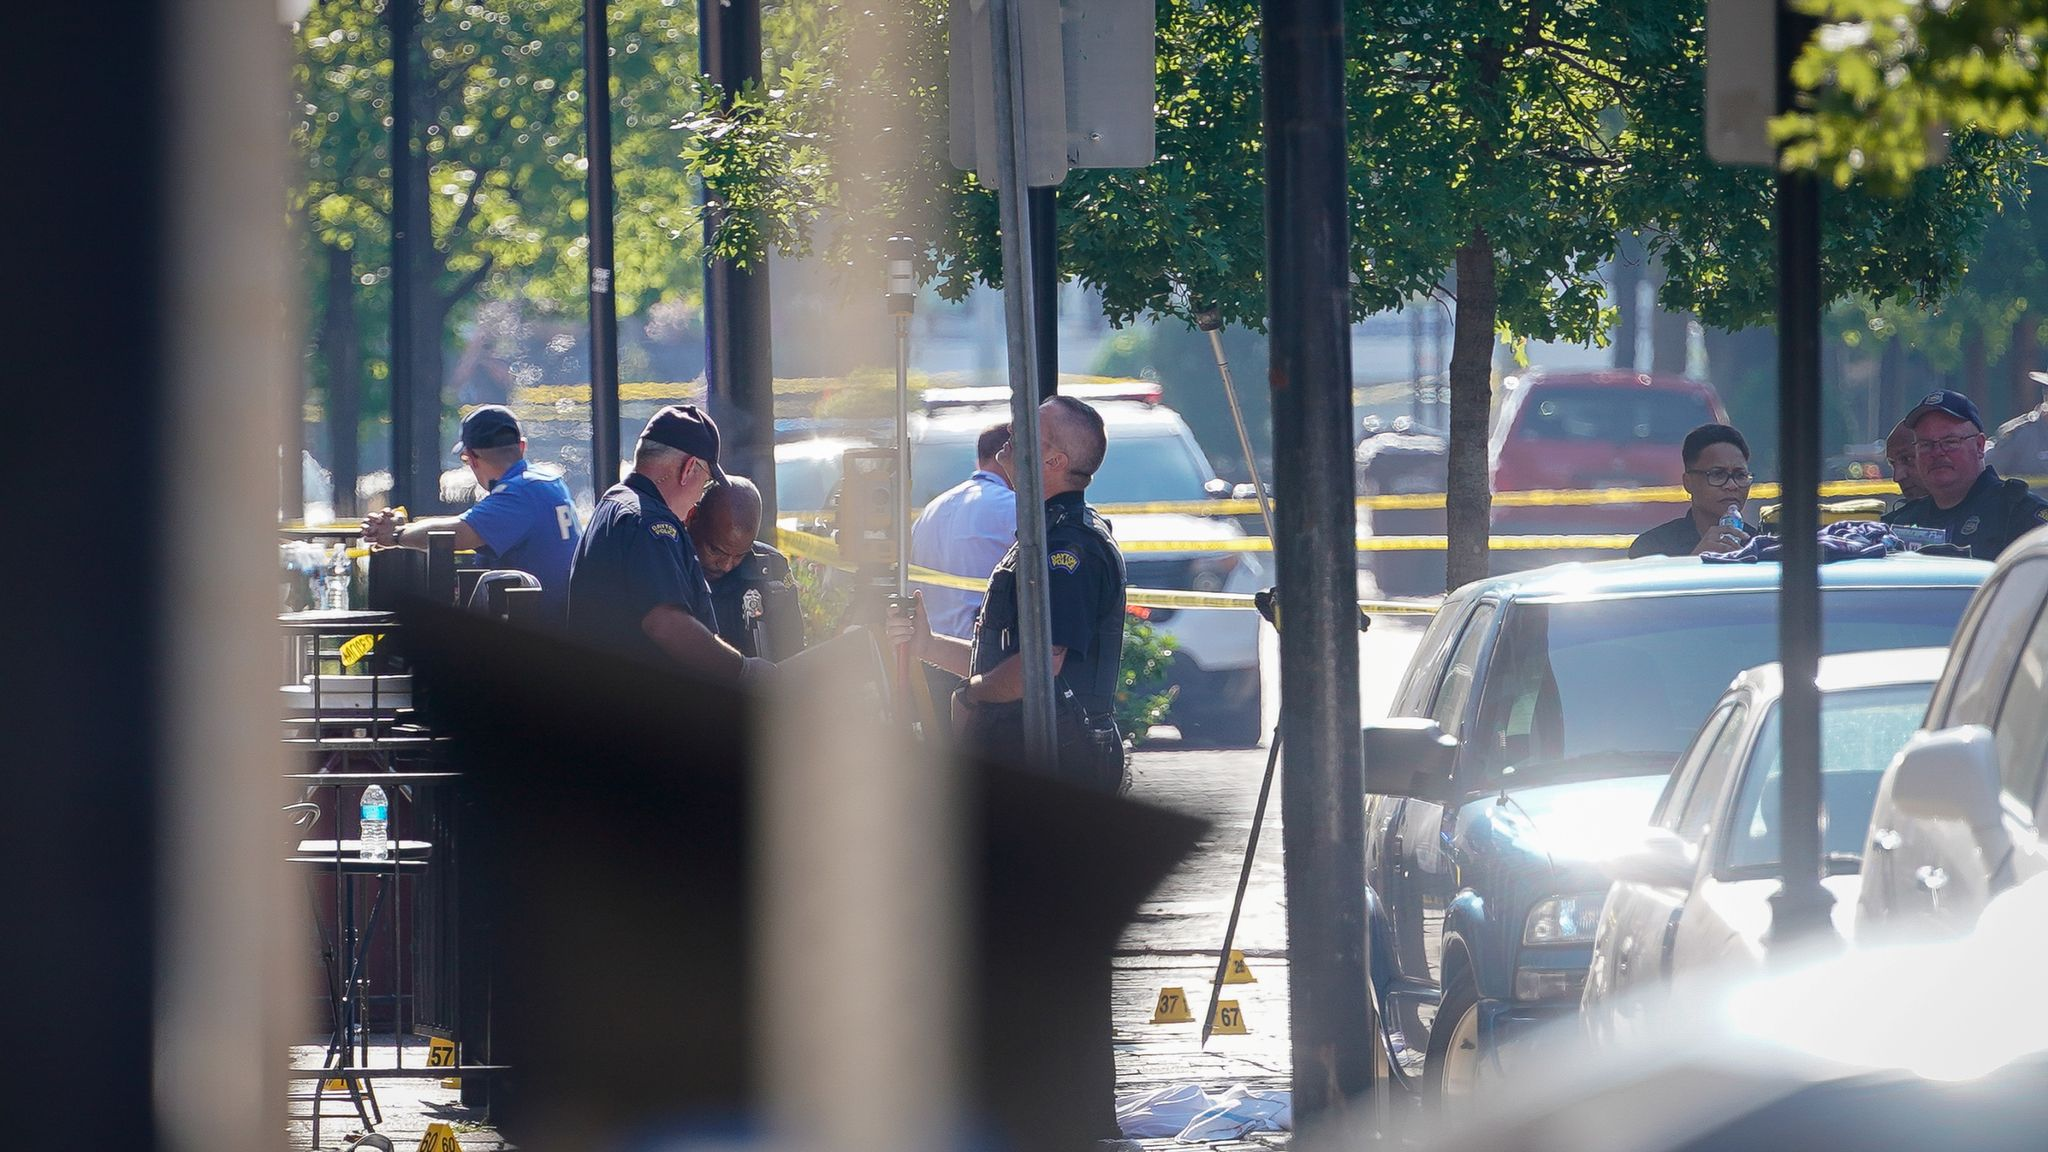 Ohio shooting: Witnesses speak of heartbreak after nine